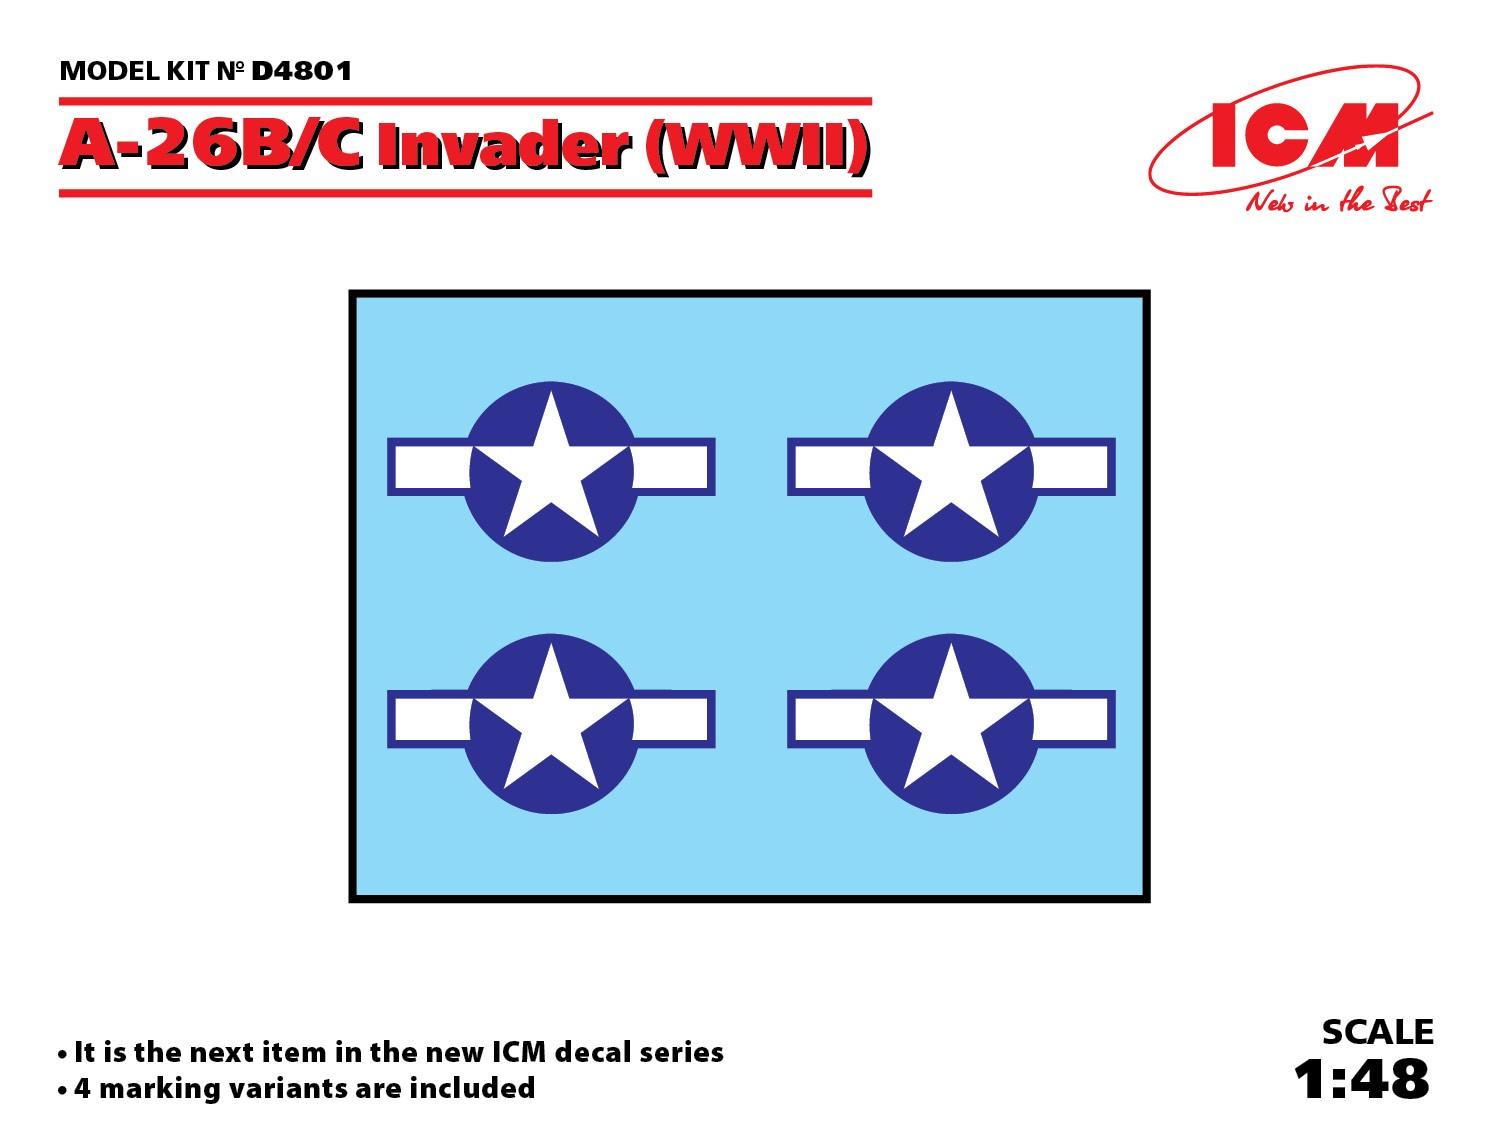 1/48 A-26B/C Invader (WWII) D4801